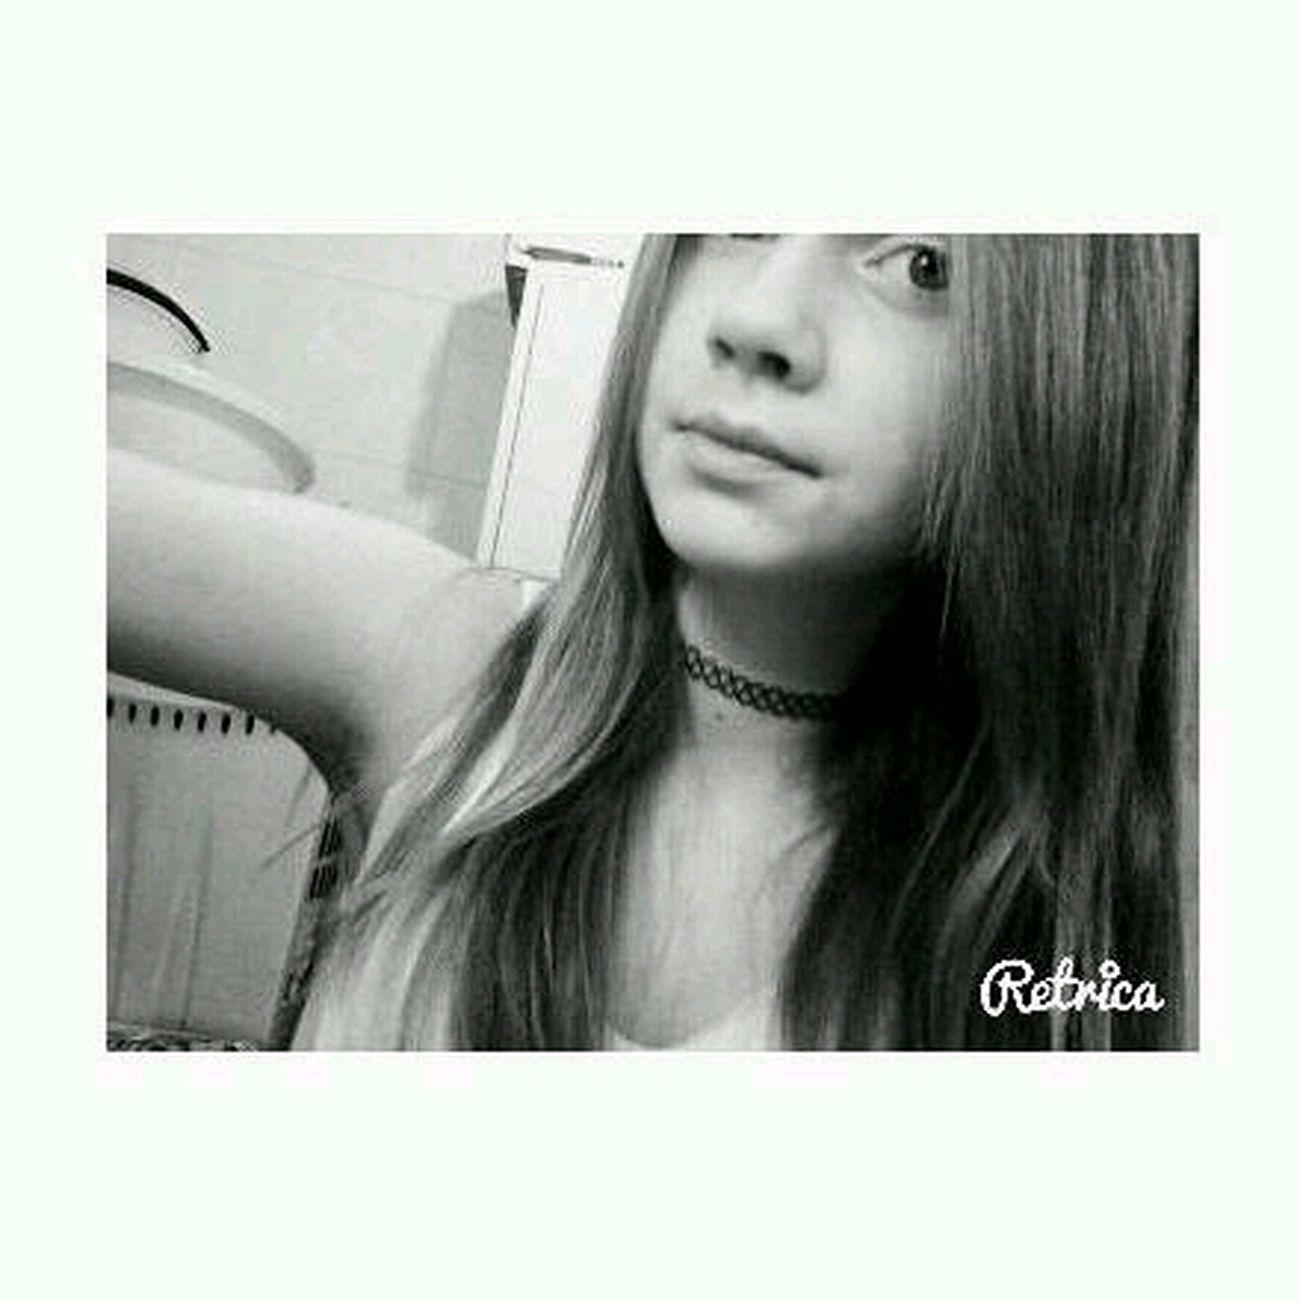 #me #cute #perfect